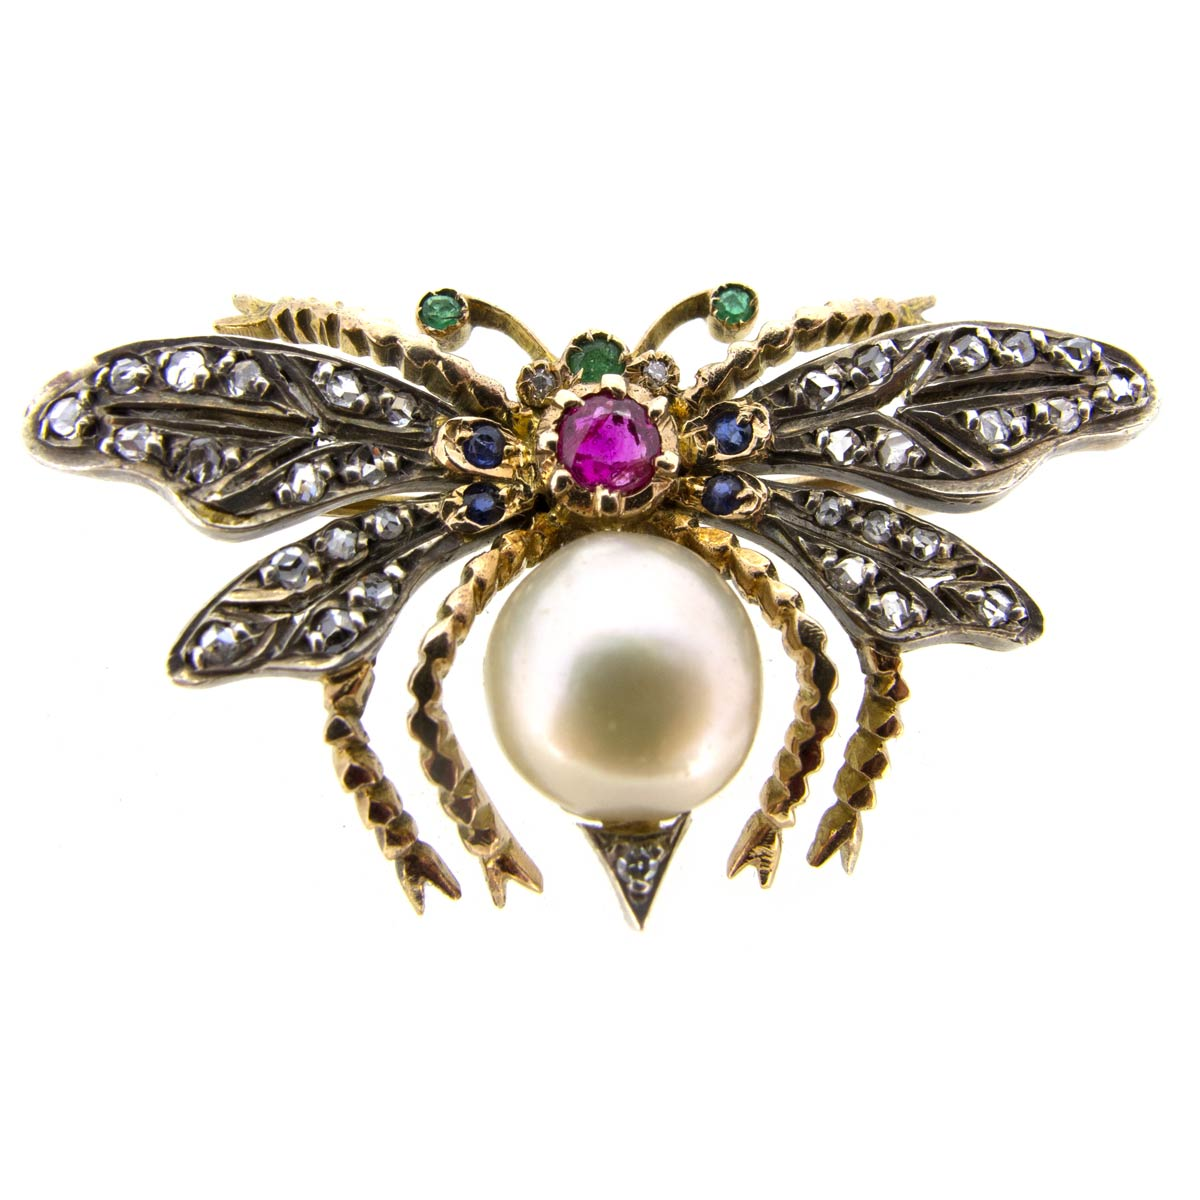 Pearl & Gem Bug Brooch